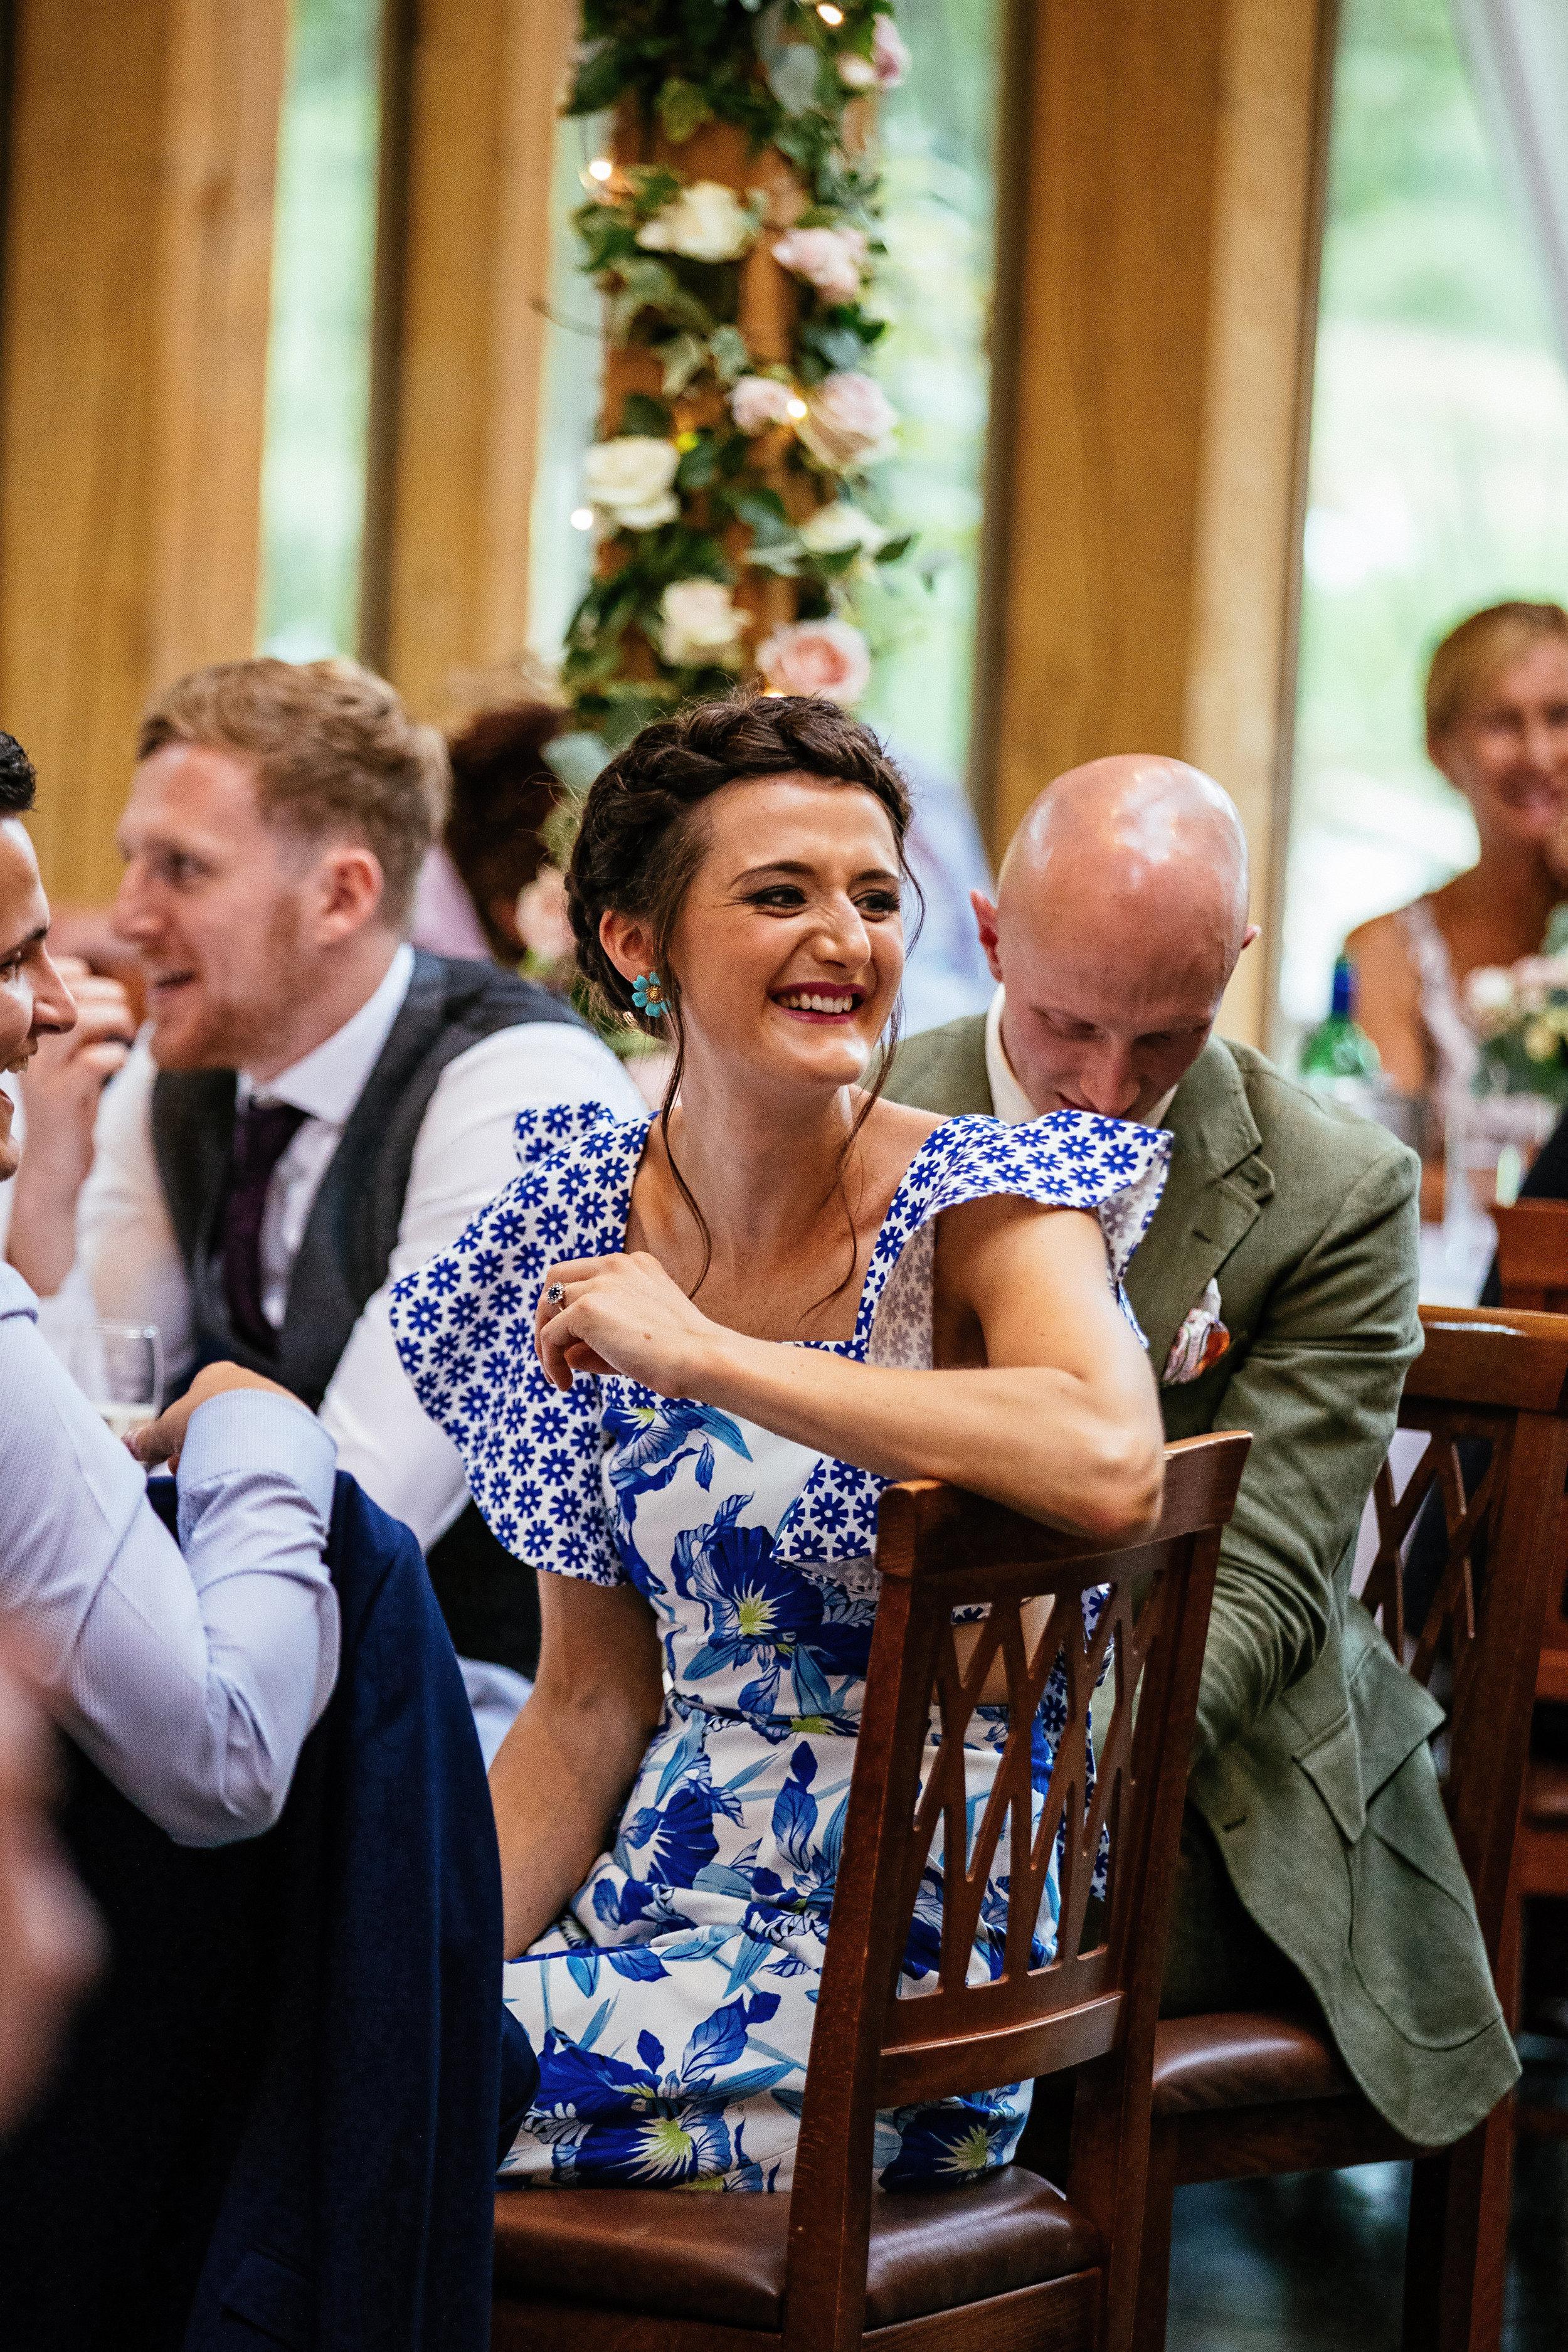 Emily-and-Peter-Wedding-Highlights-87.jpg